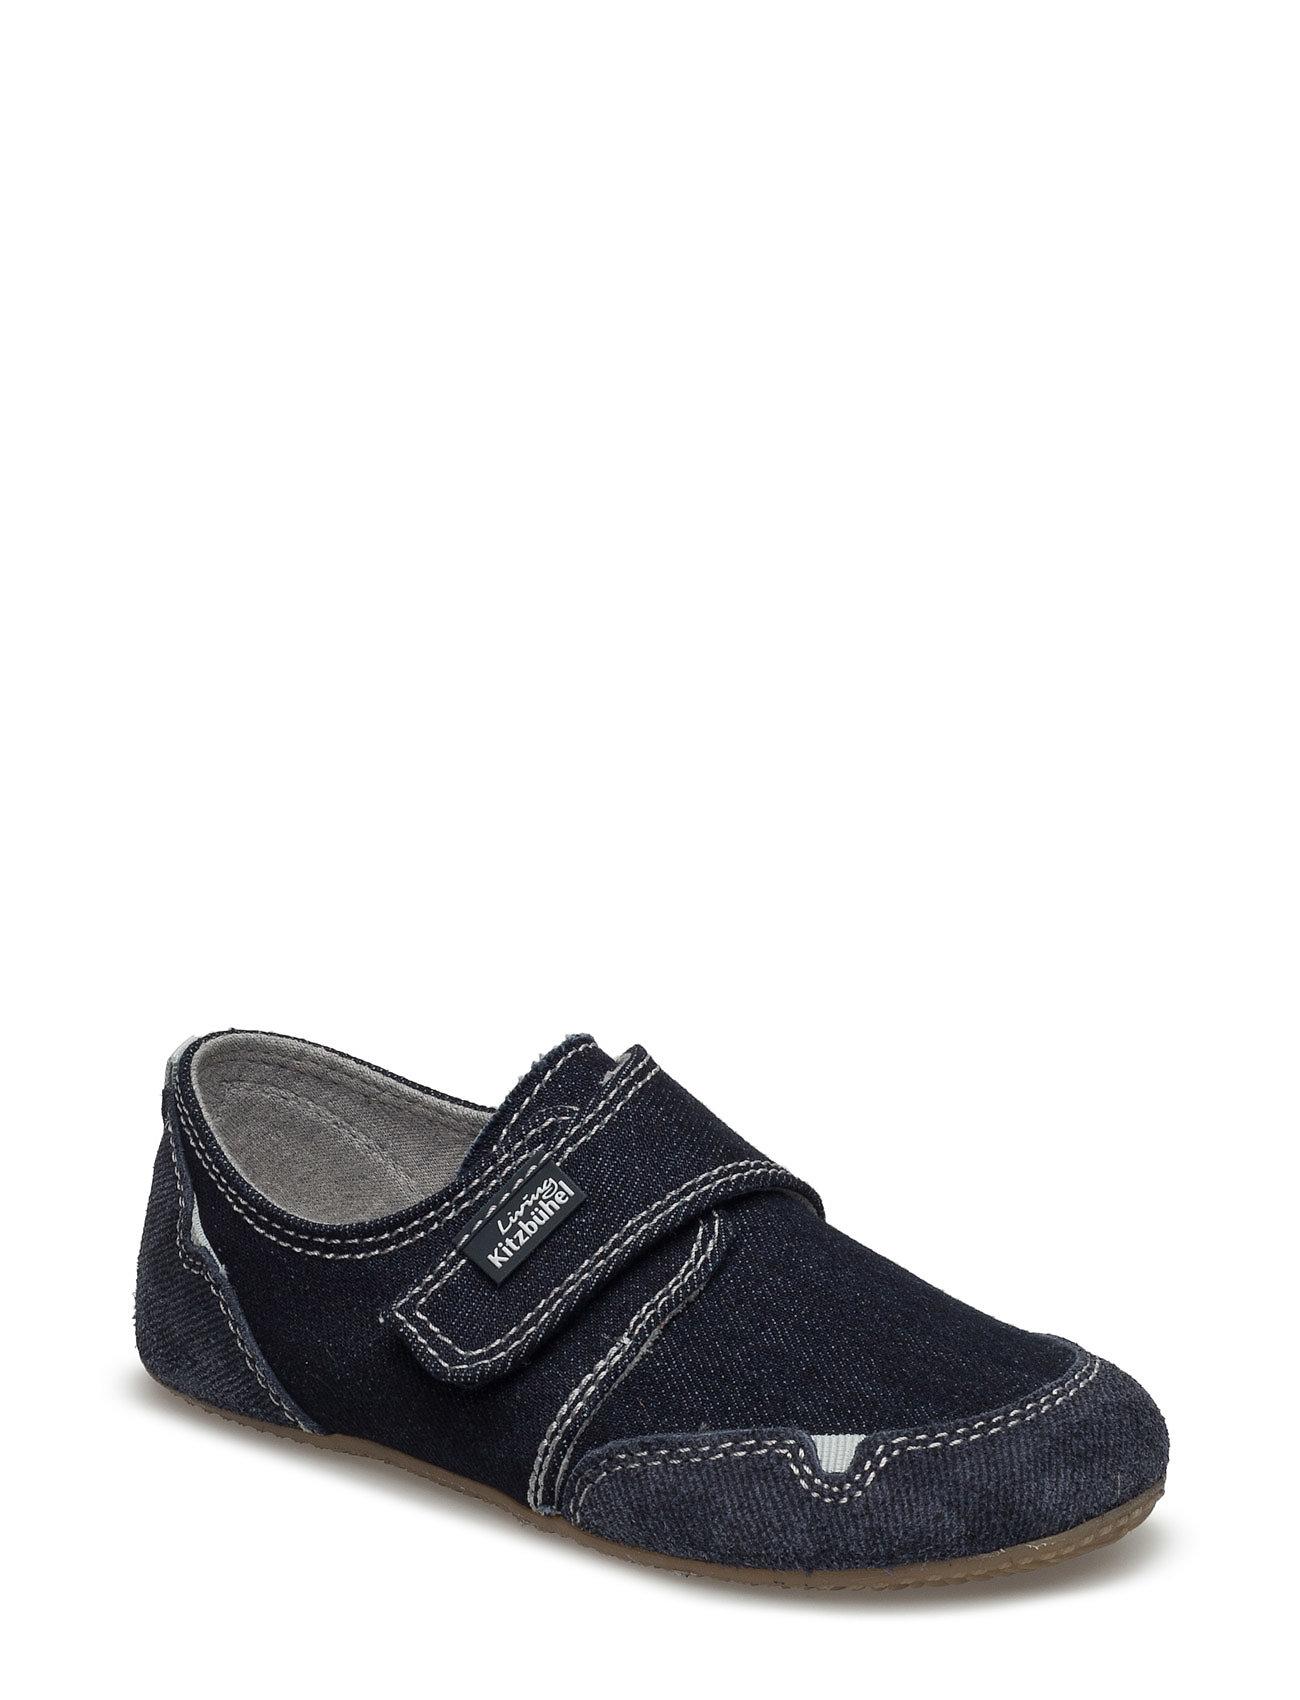 410ea82b0314 Shoe With Velcro Living Kitzbuhel Hjemmesko til Børn i ...